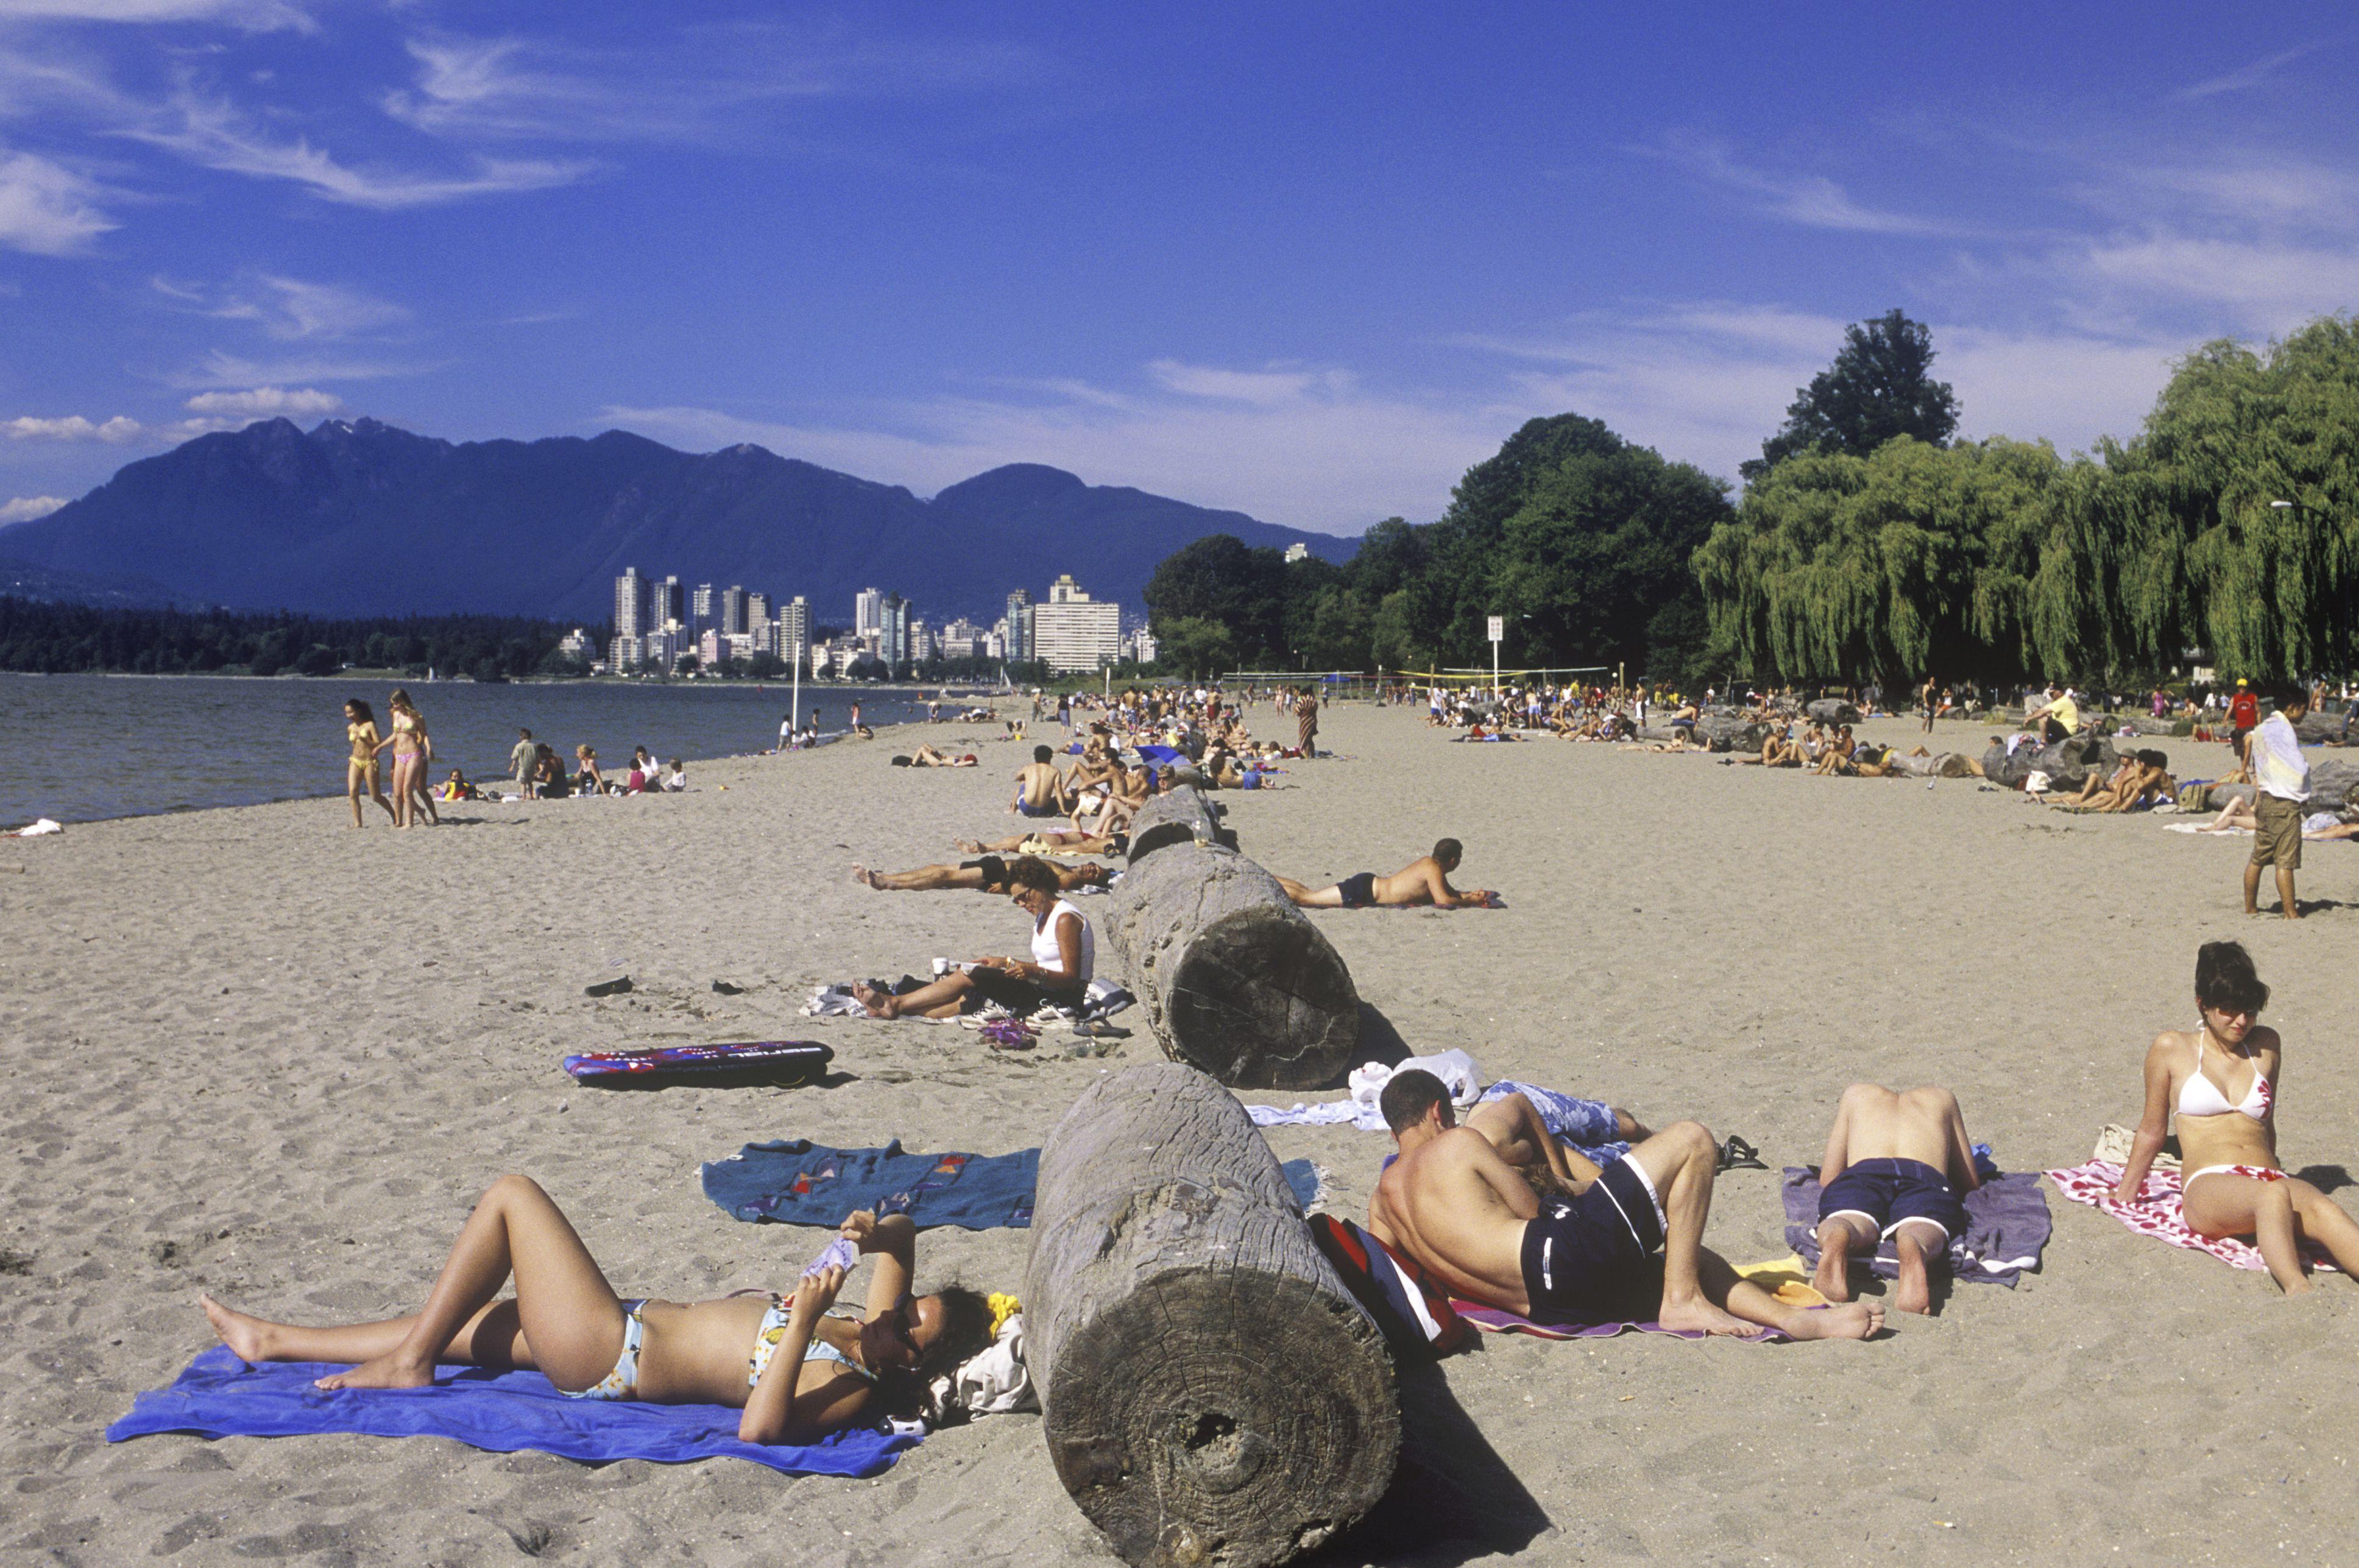 Sunbathers on Kitsilano Beach, Vancouver, BC